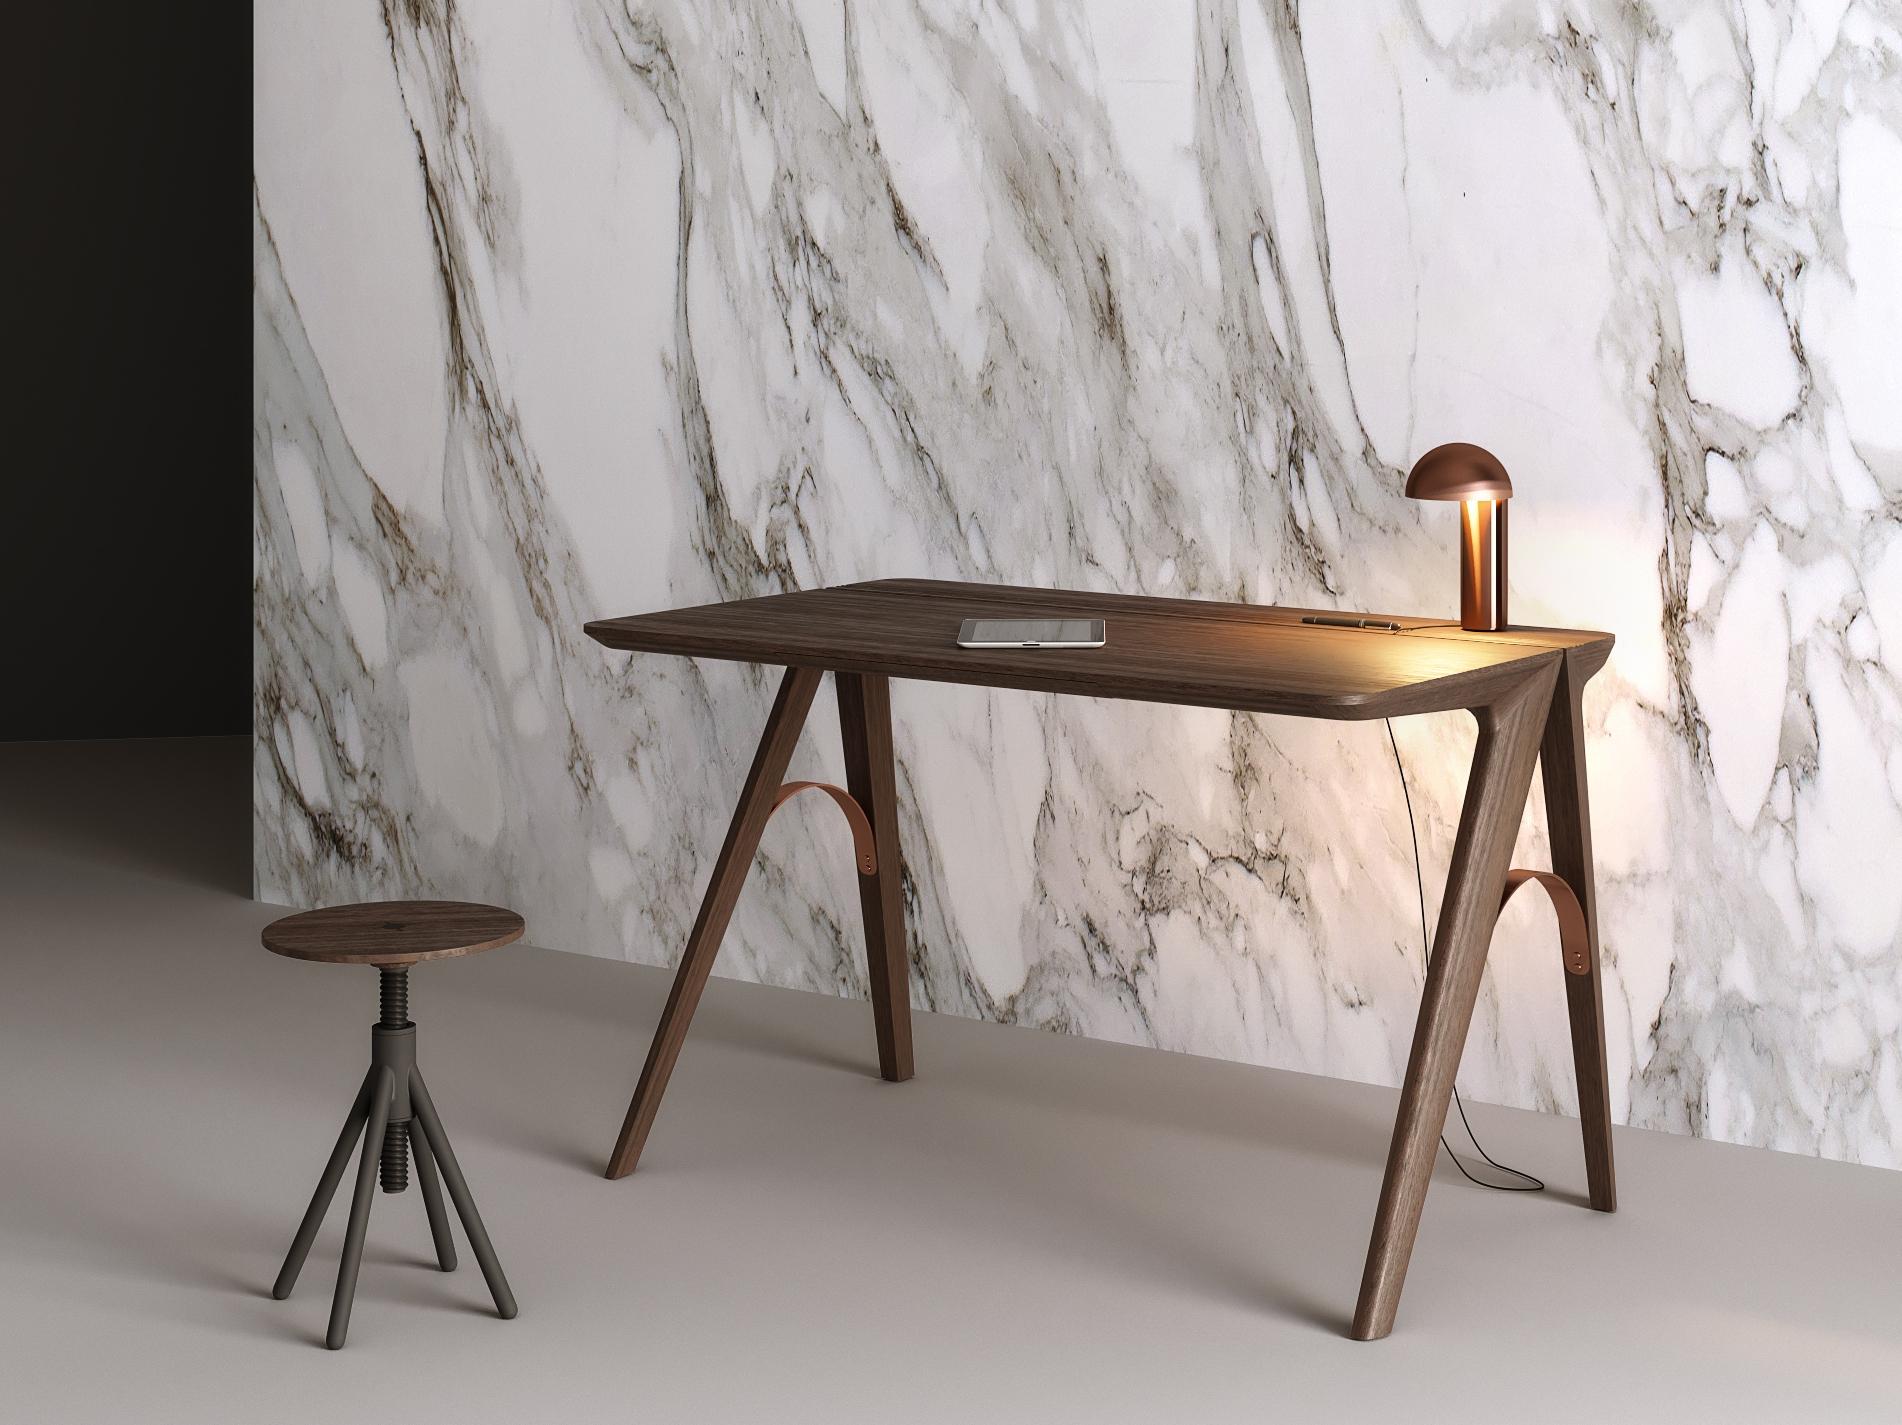 Associative Design_The Best of Portugal Bridge Desk by Christophe de Sousa for Wewood